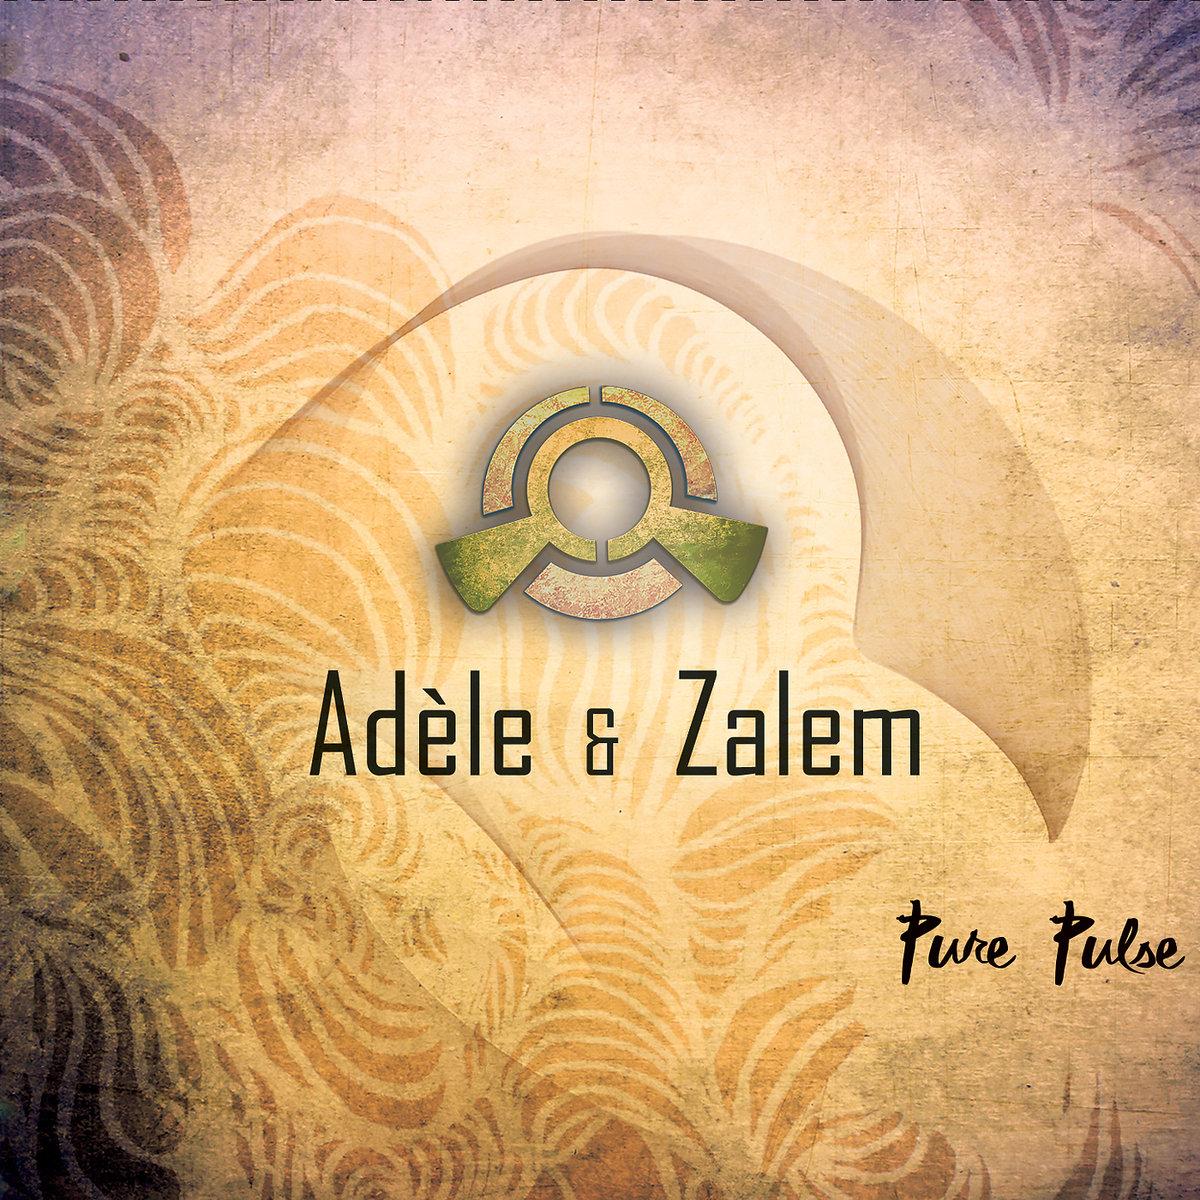 Adèle & Zalem - Pure Pulse